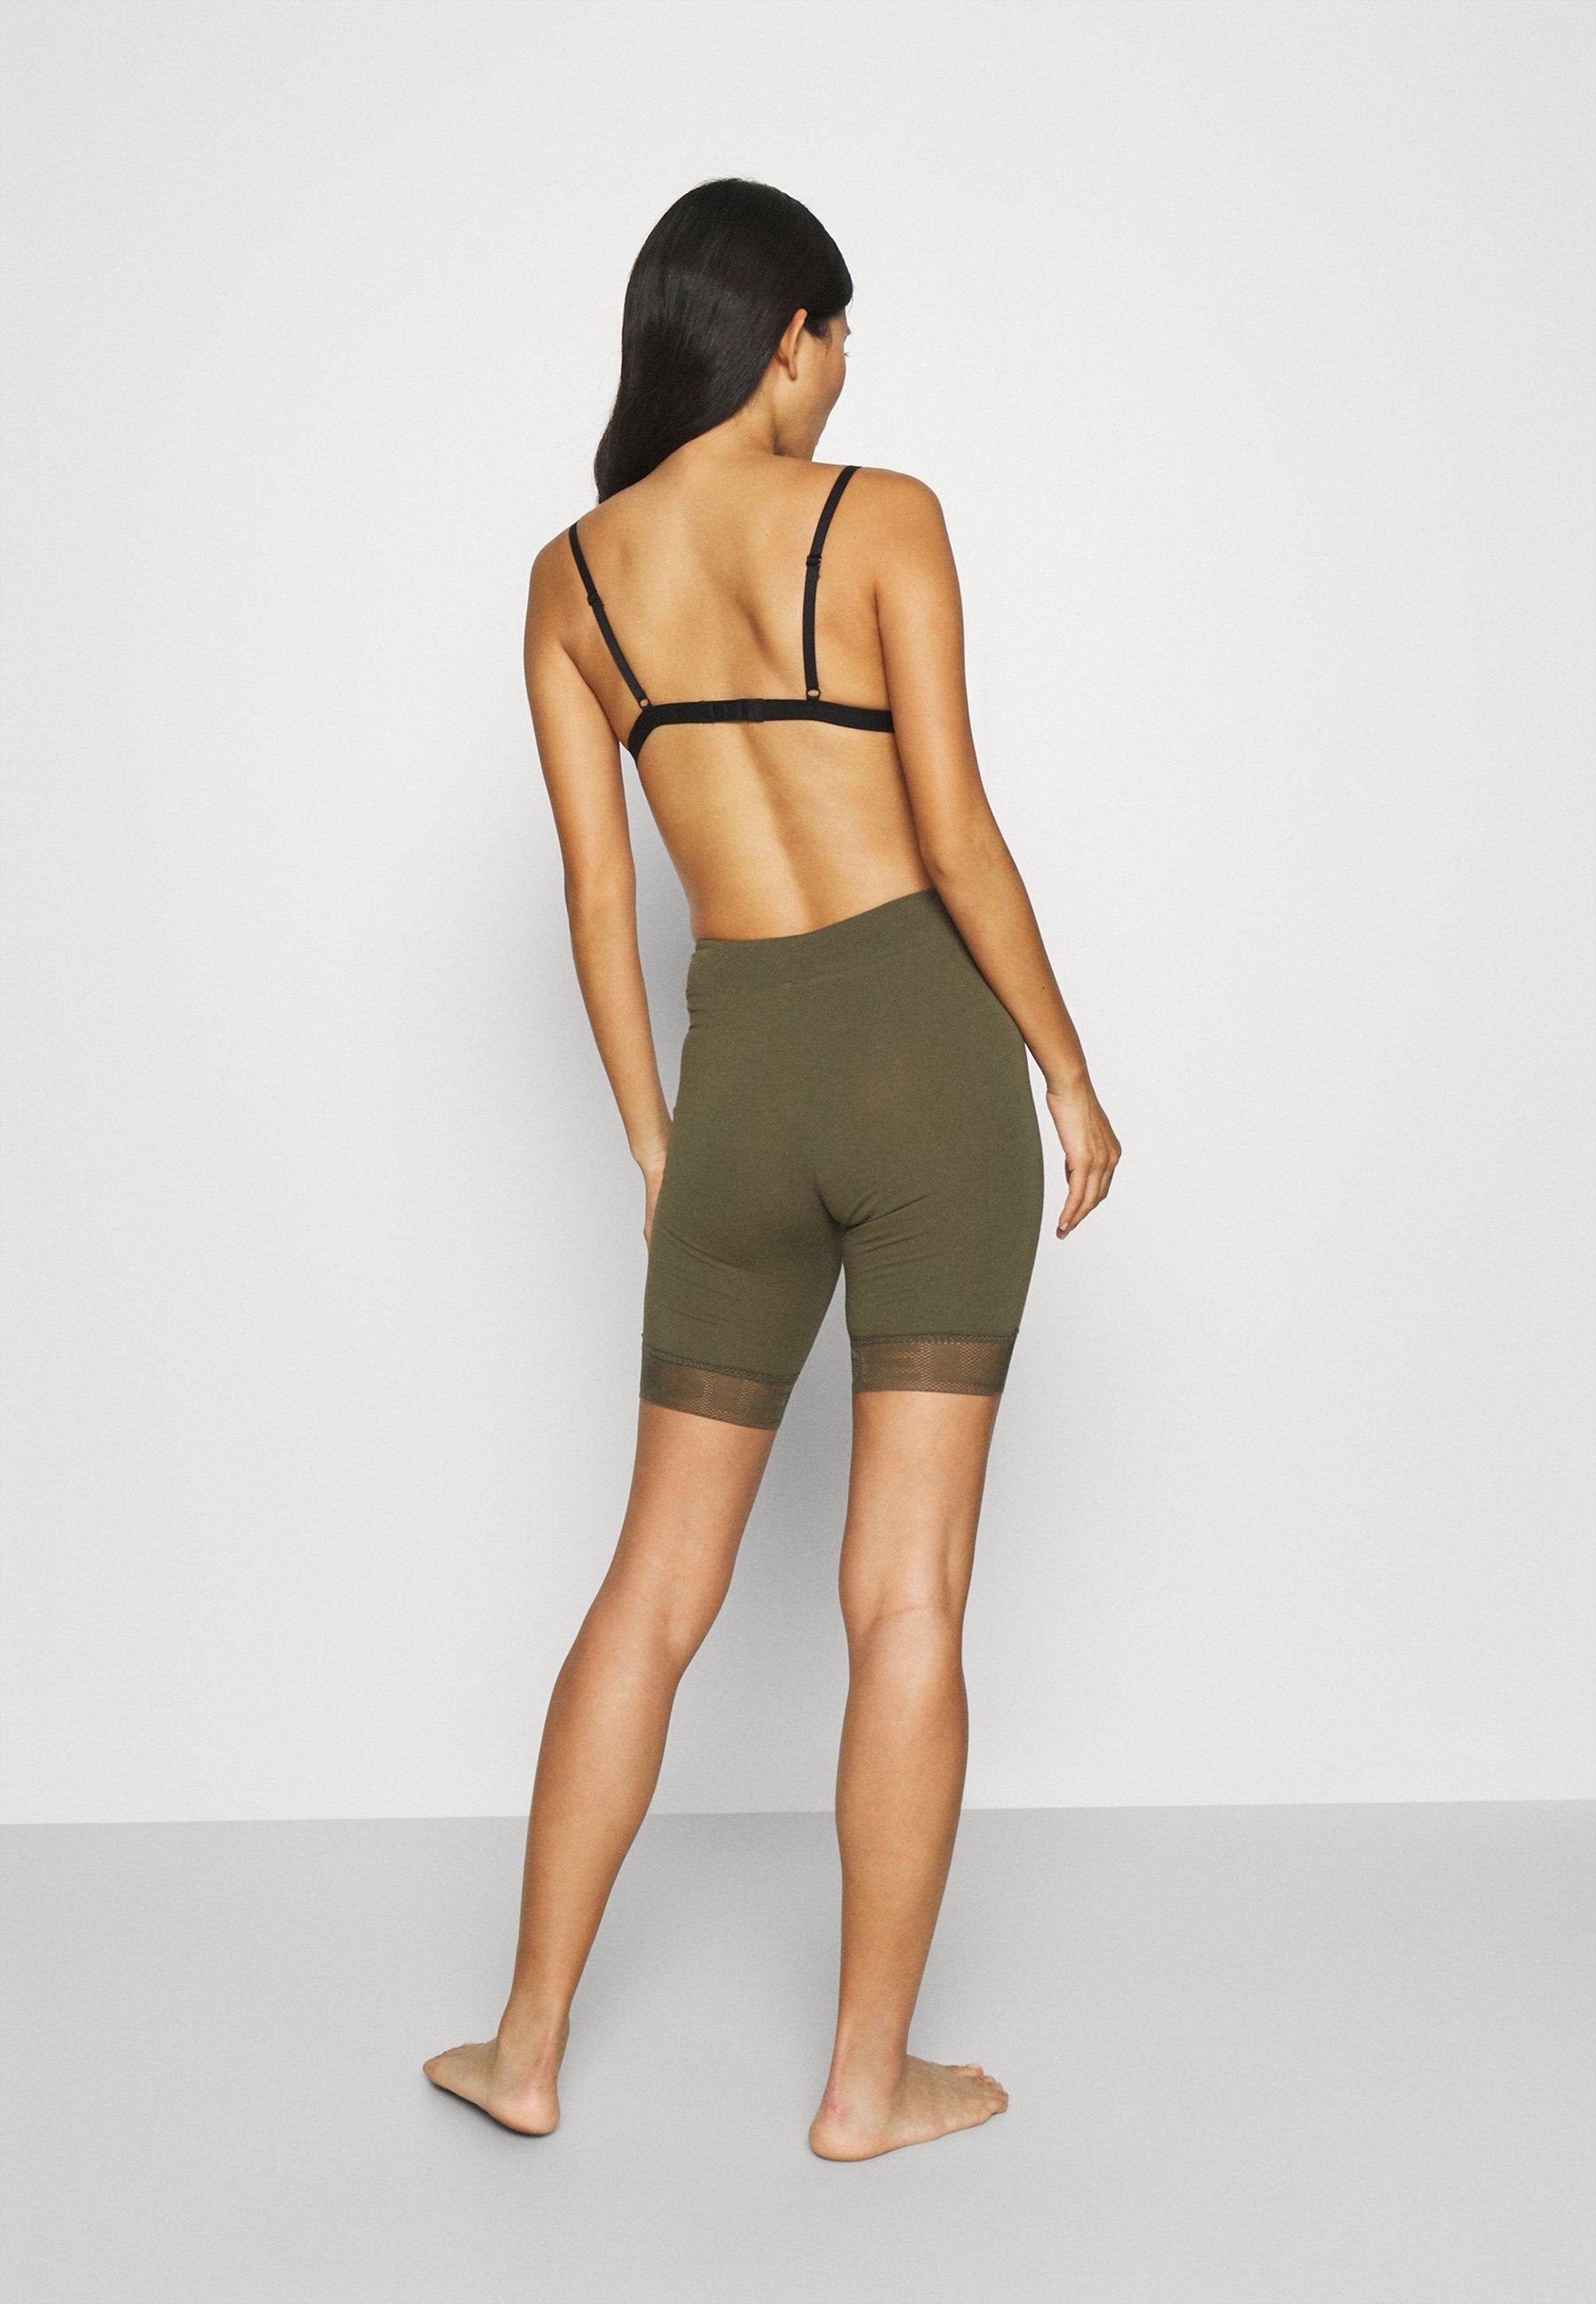 Donna UFLB-FAUSTMESH - Pantaloni del pigiama